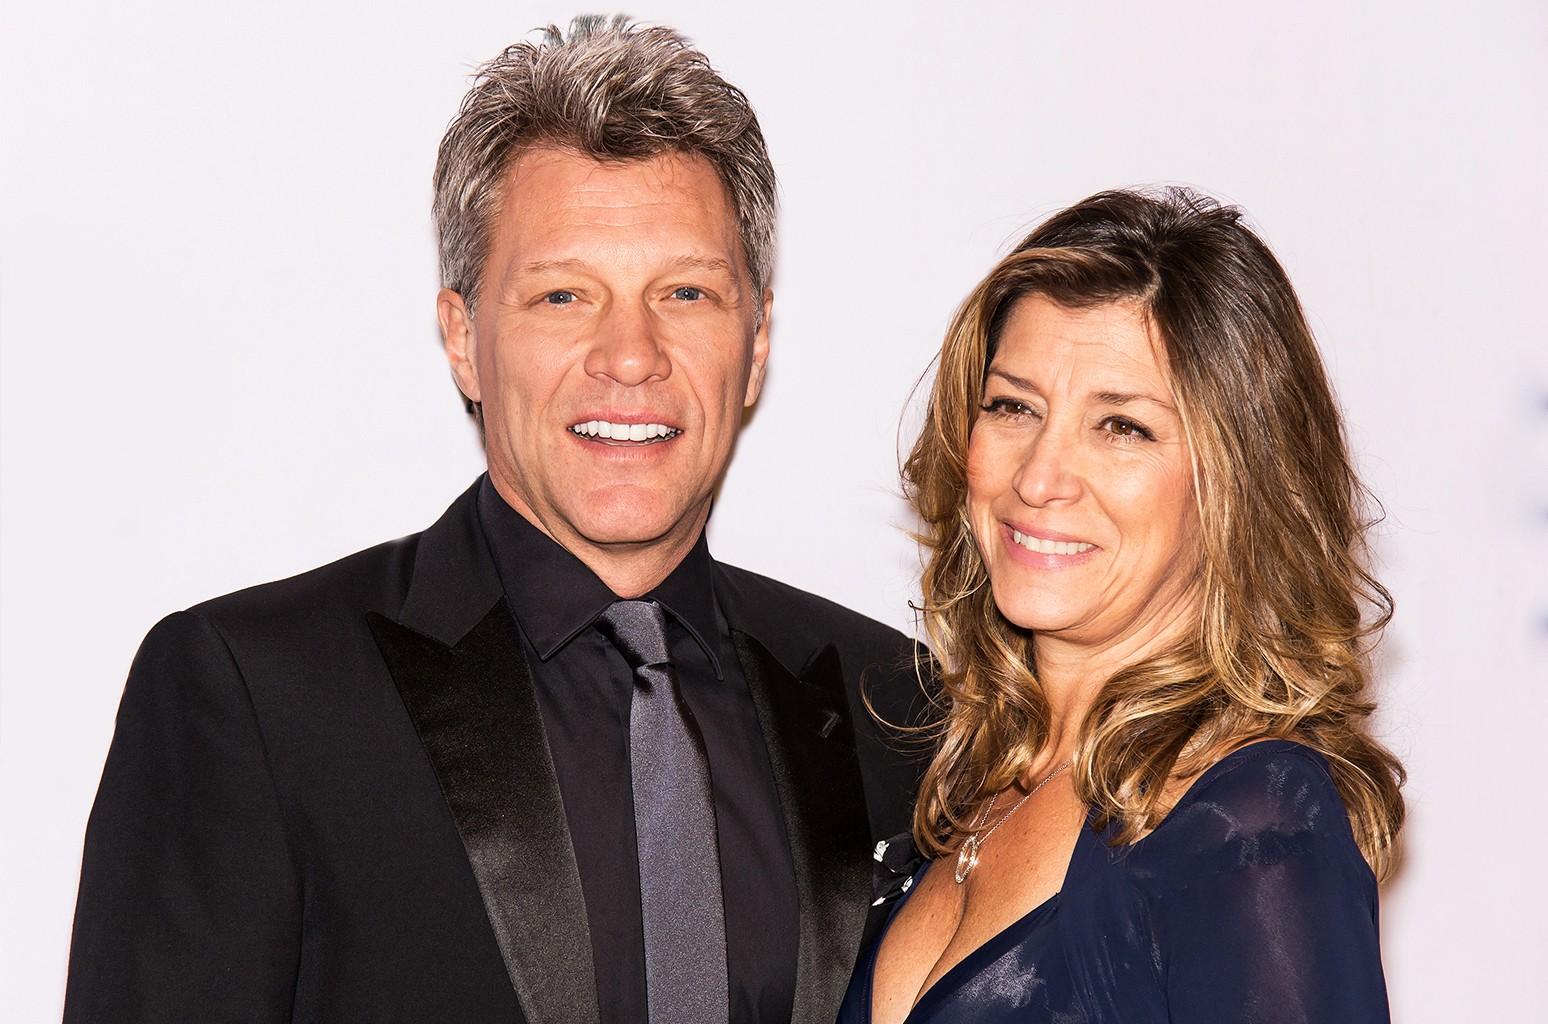 Jon Bon Jovi and wife Dorothea Hurley, 2014